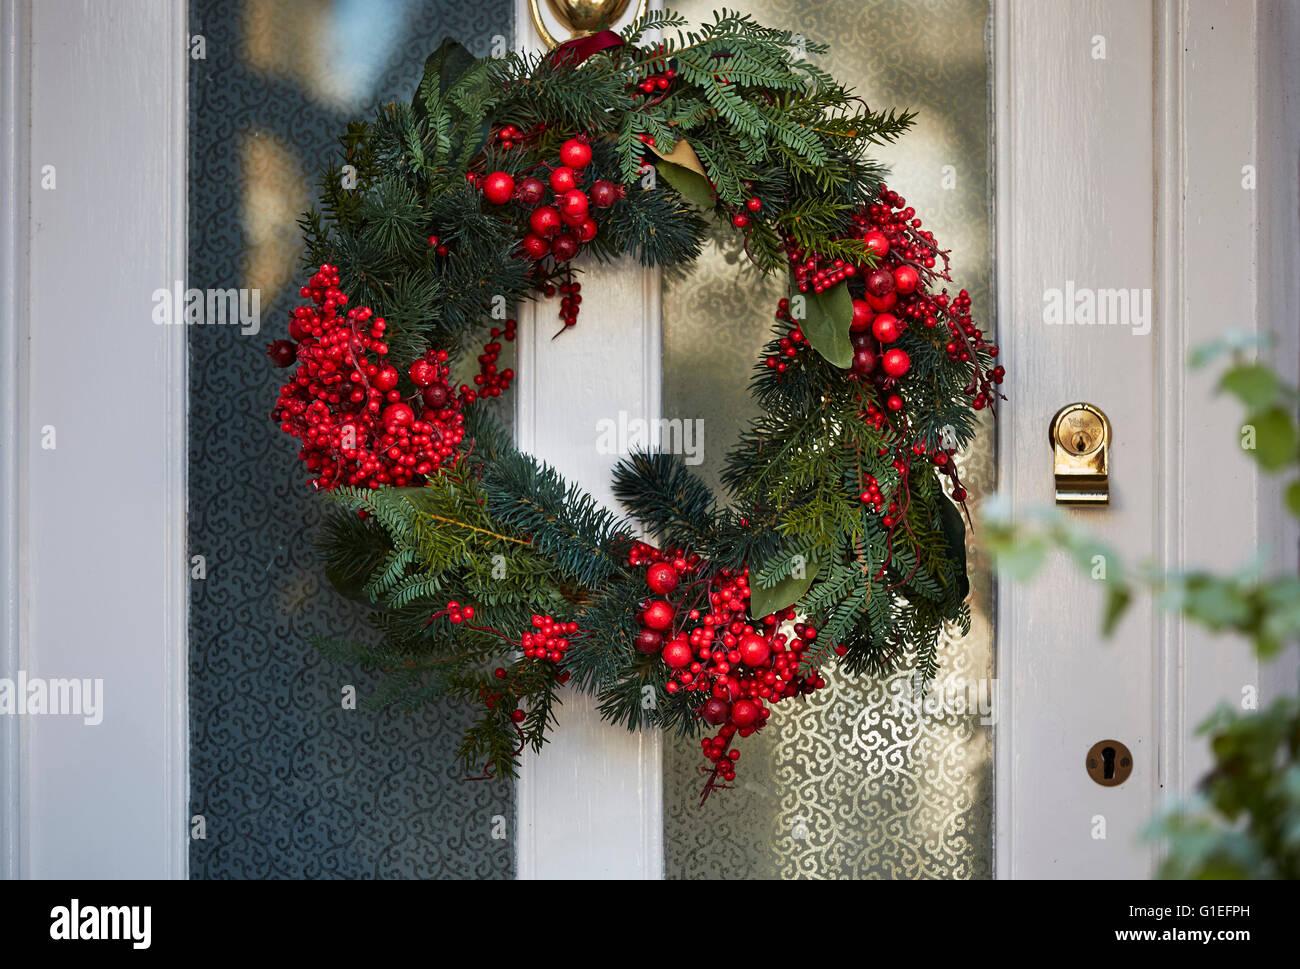 Christmas Garland on Door. - Stock Image